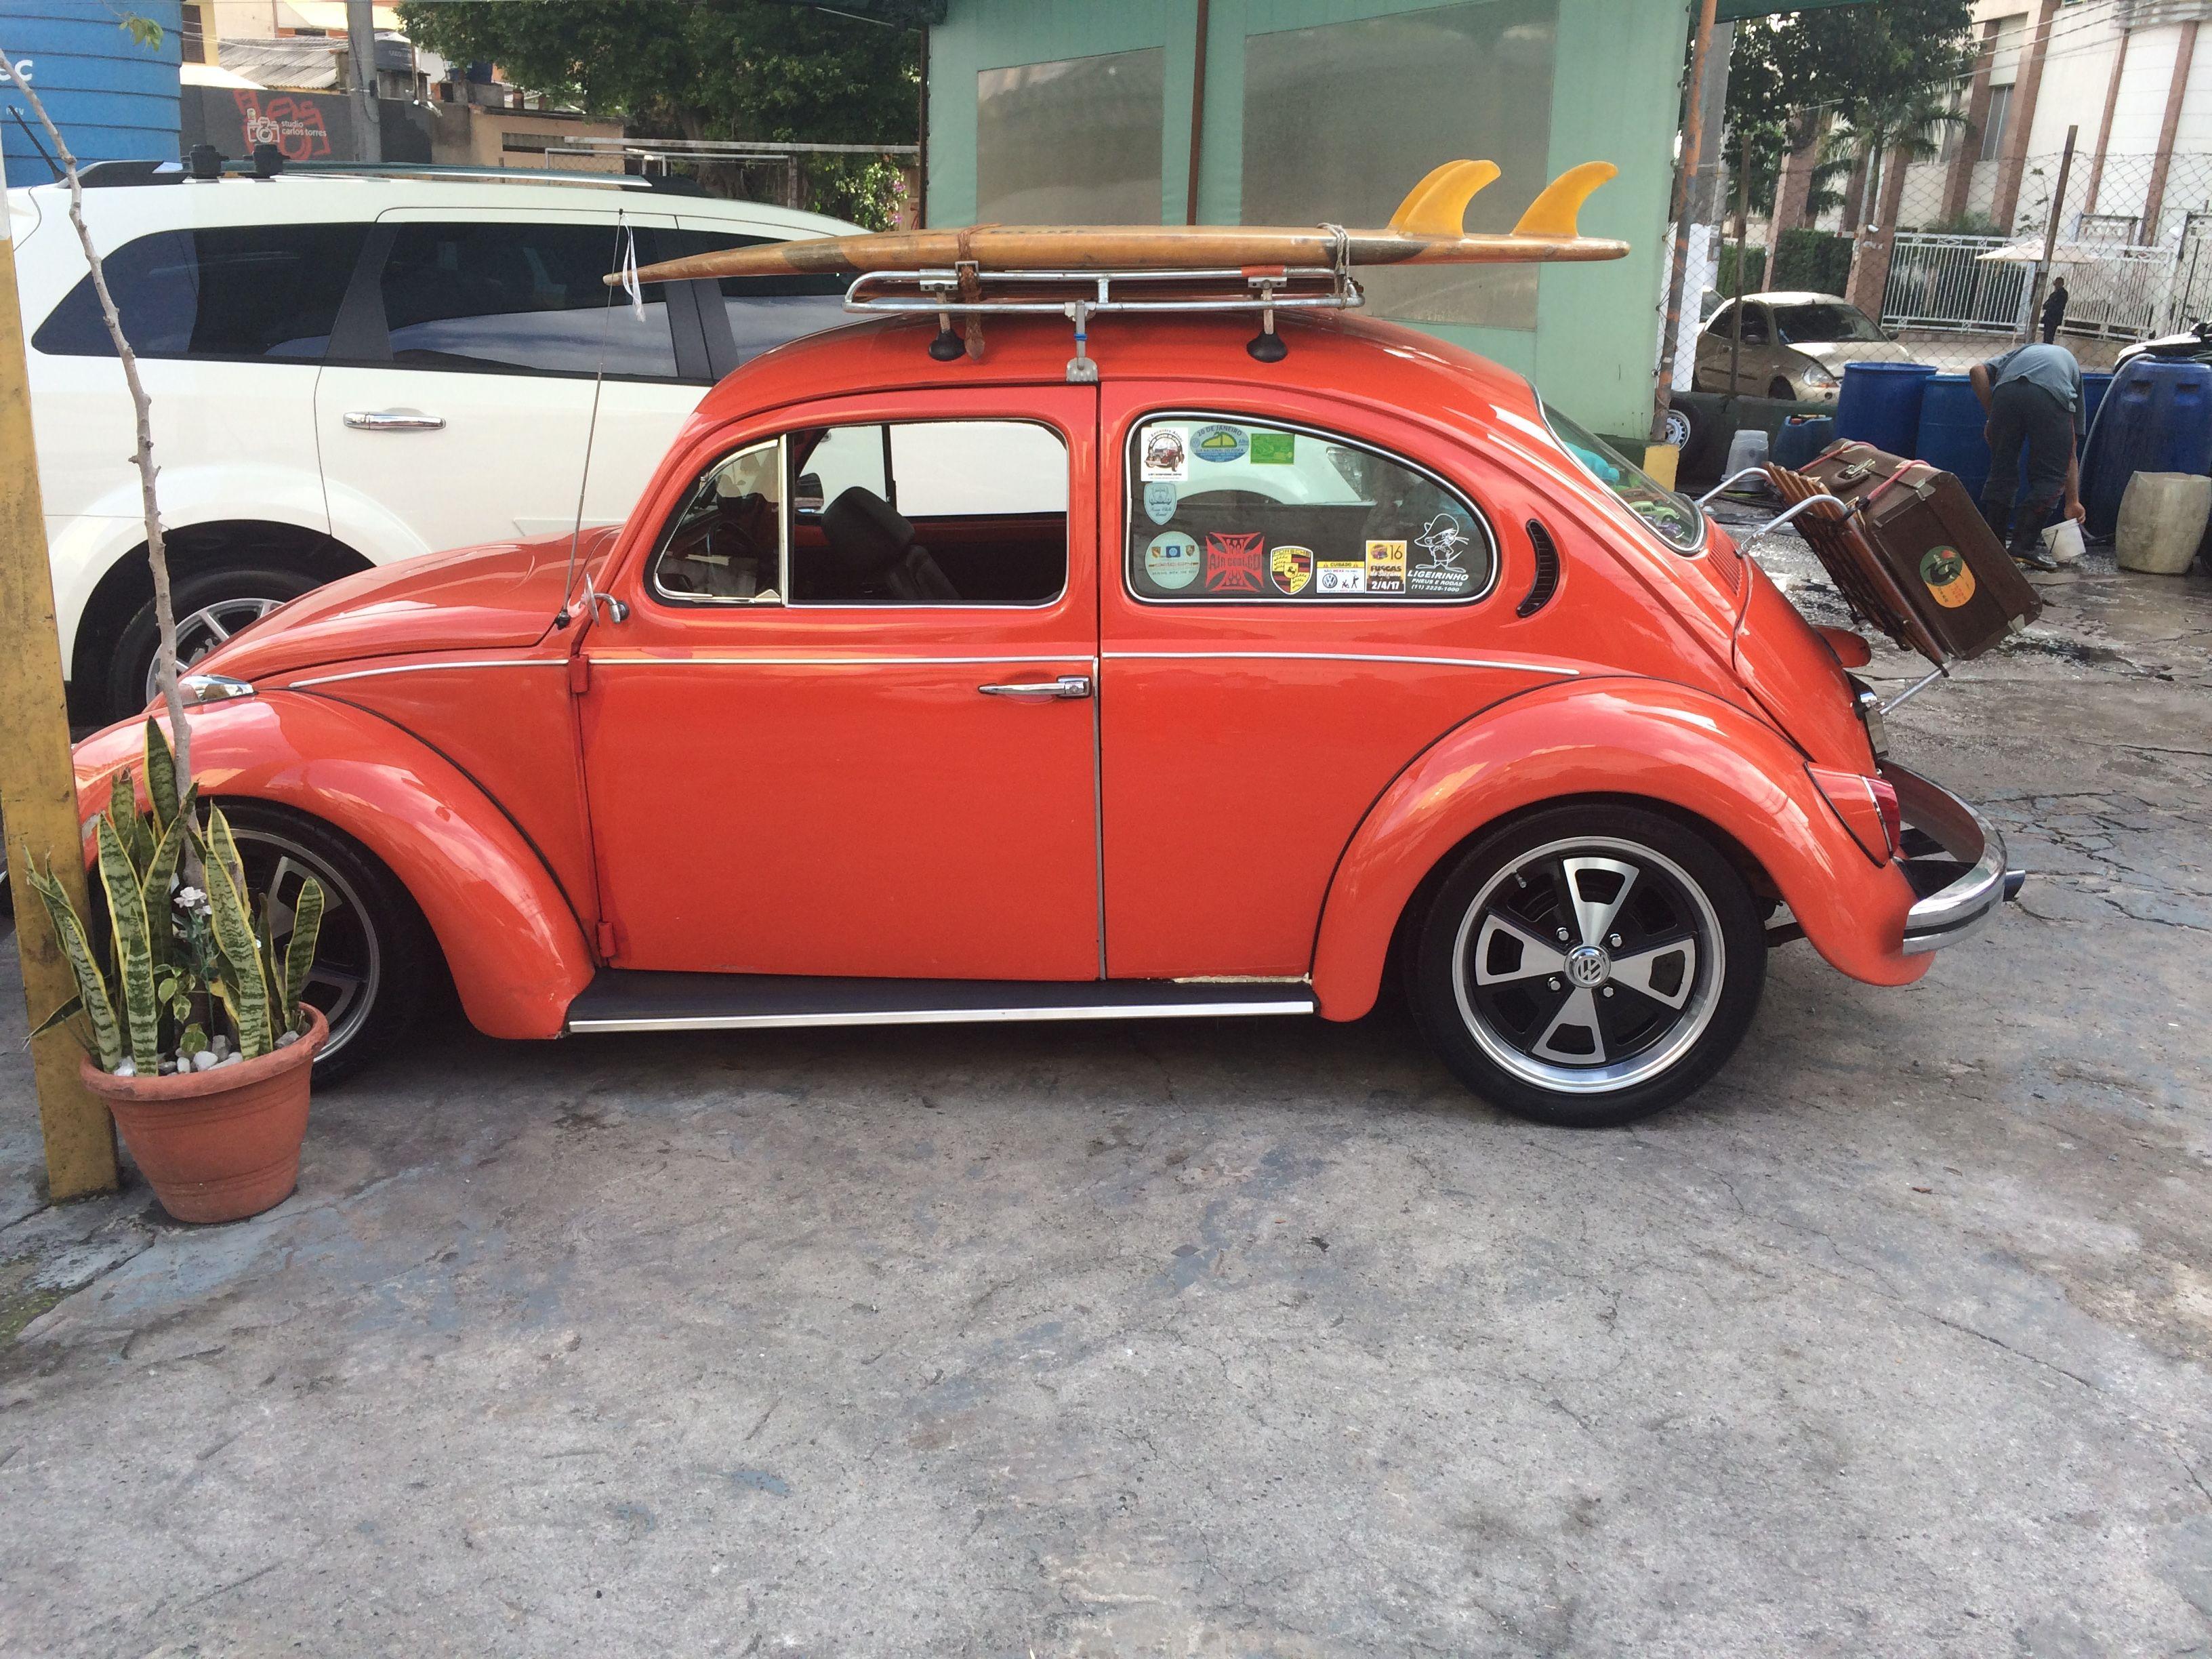 showthread gti cto volkswagen fbmhwtq miles ad beetle red matchstick sale vwvortex for com grandrapids craigslist org